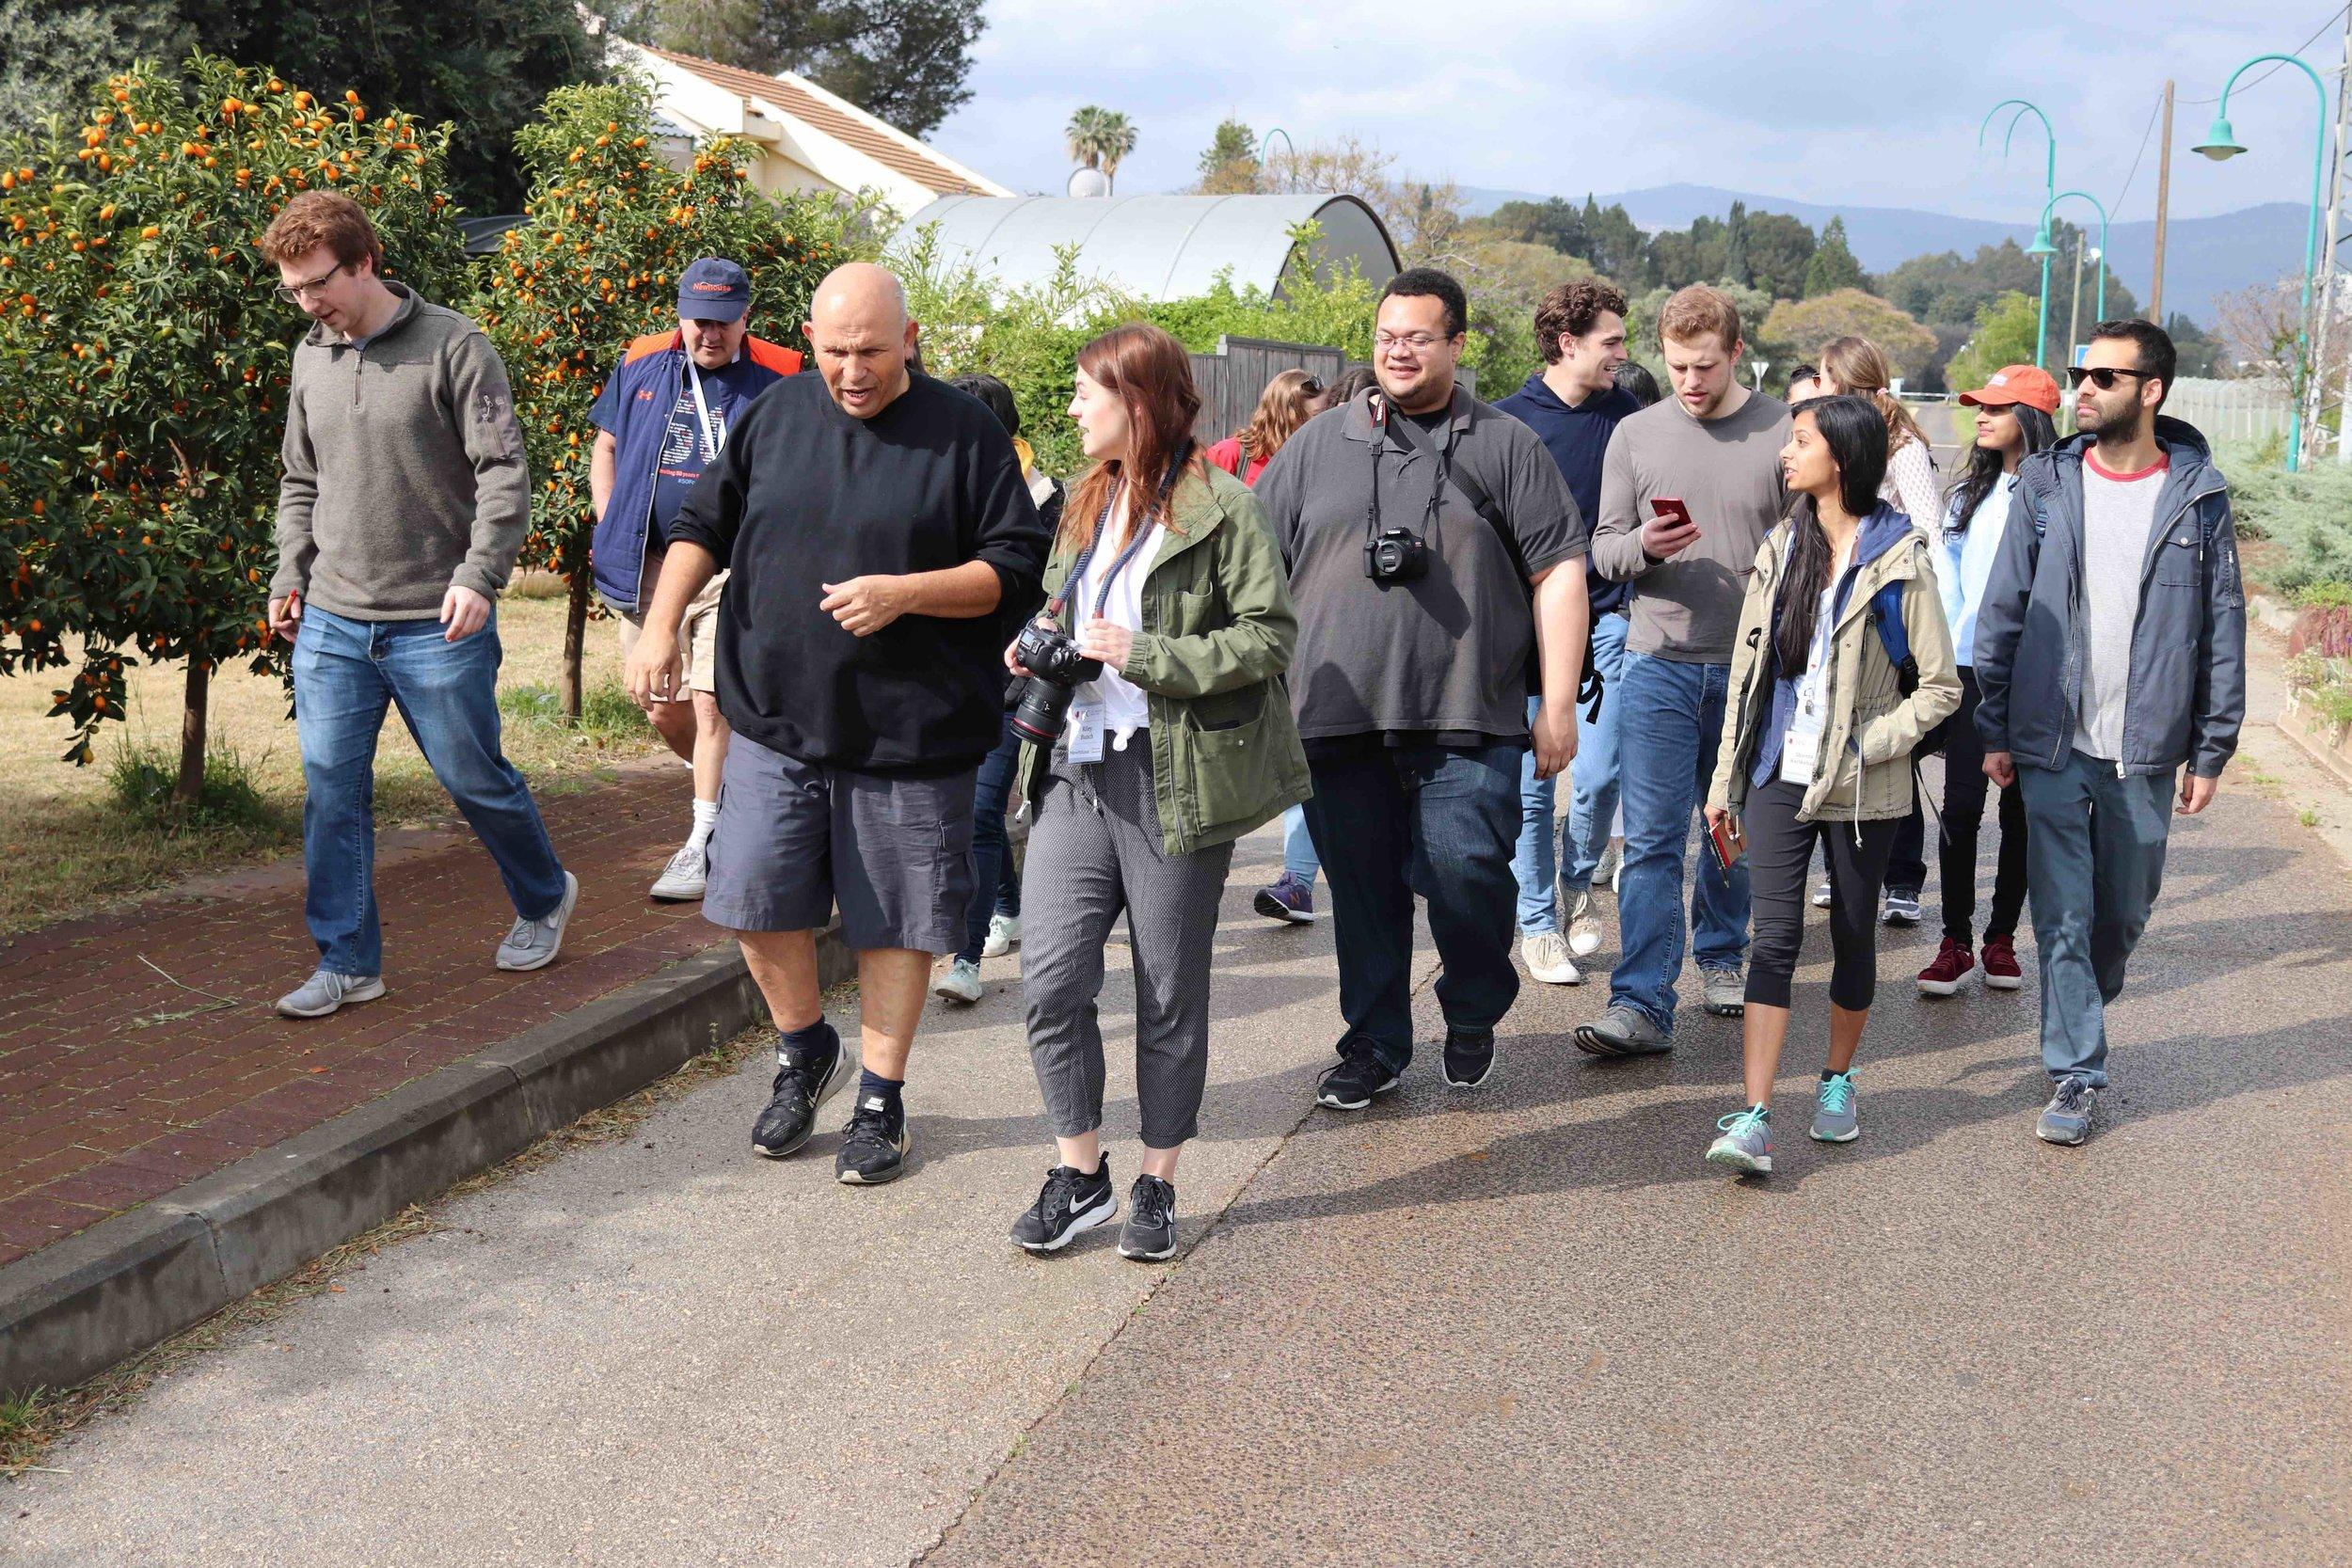 Barry Praag leading students on a tour of Kibbutz Dafna.